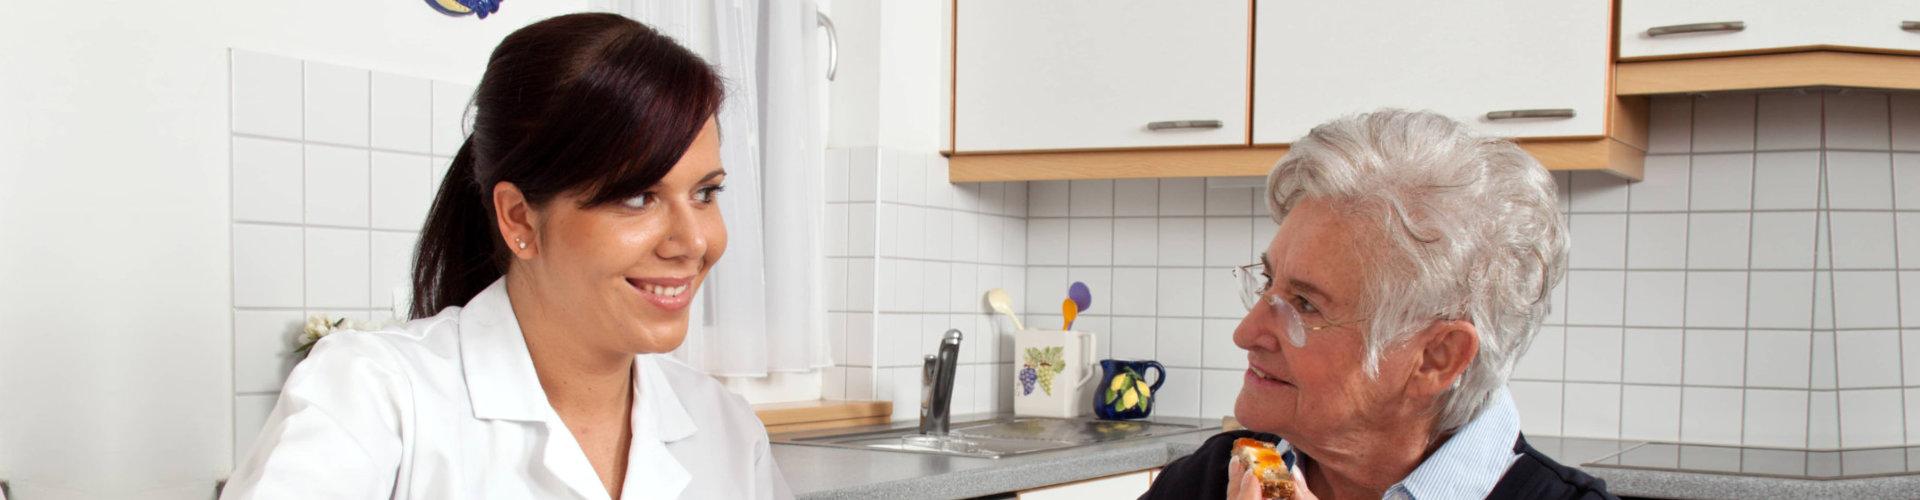 caregiver assisting senior woman to eat